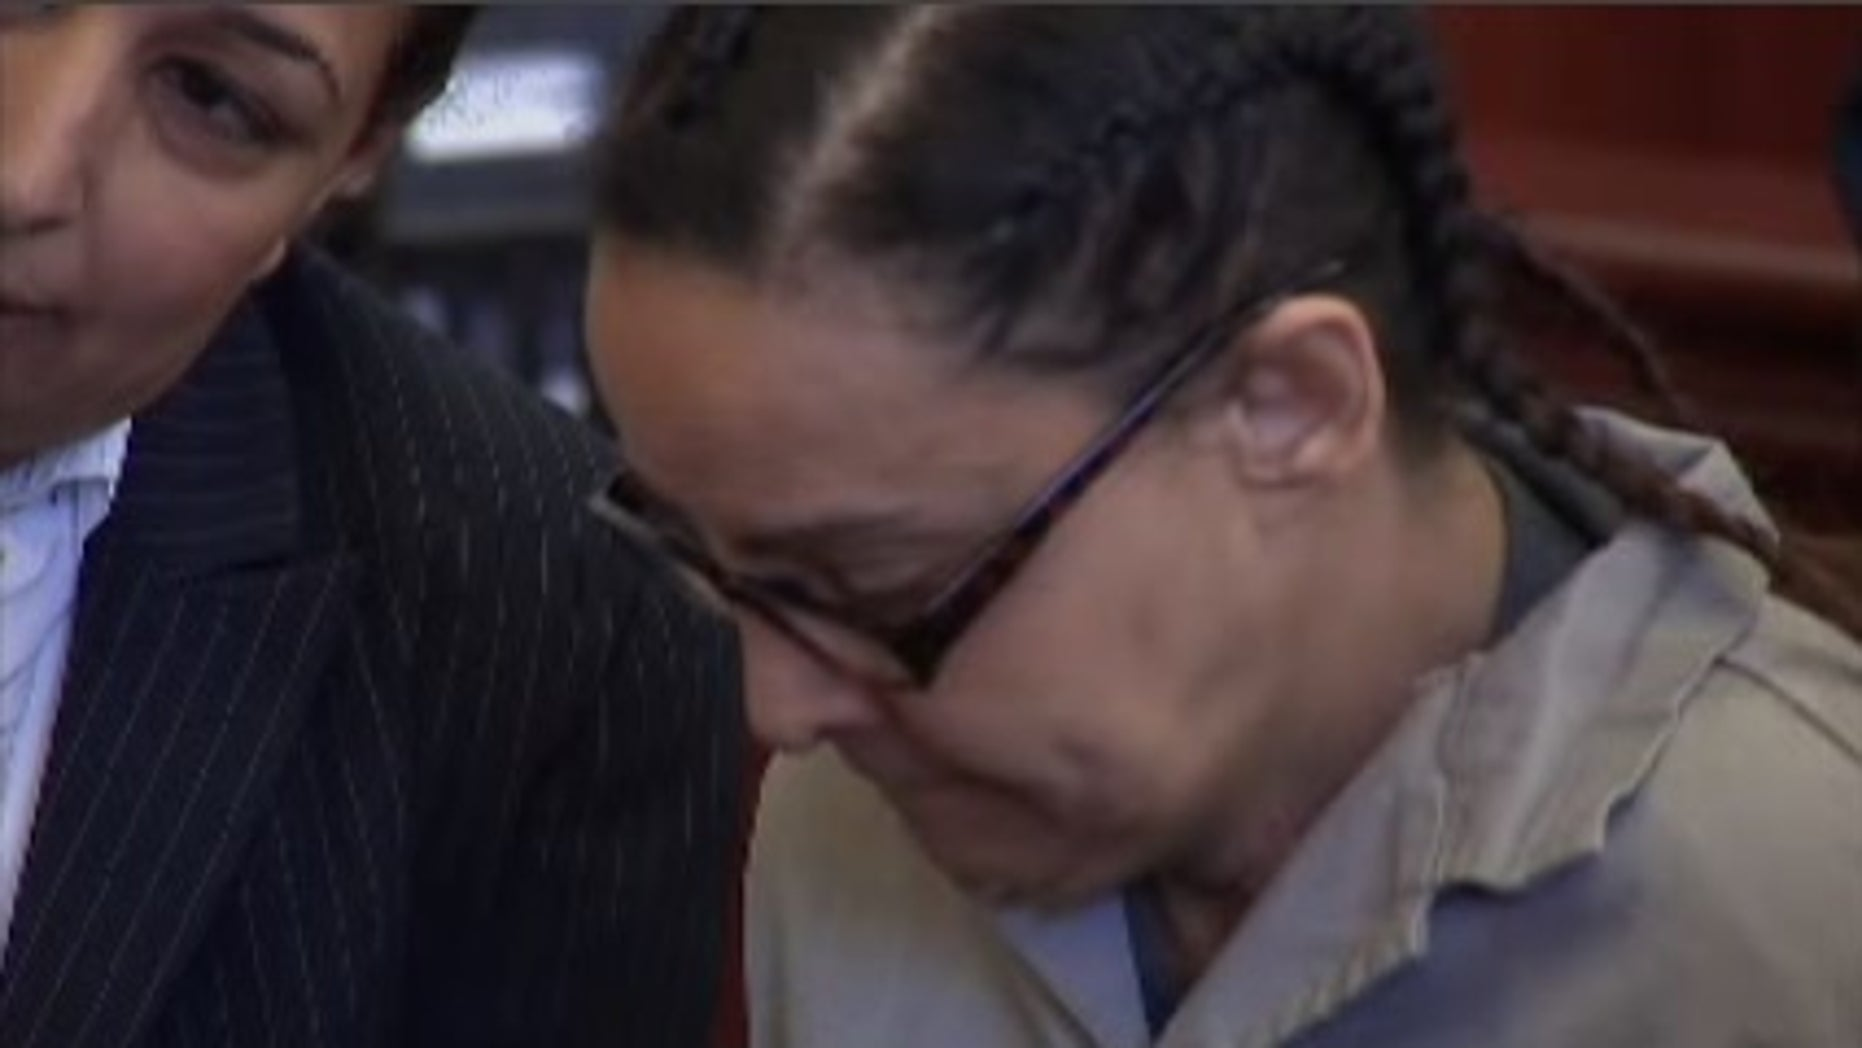 Yoselyn Ortega in court in 2013.